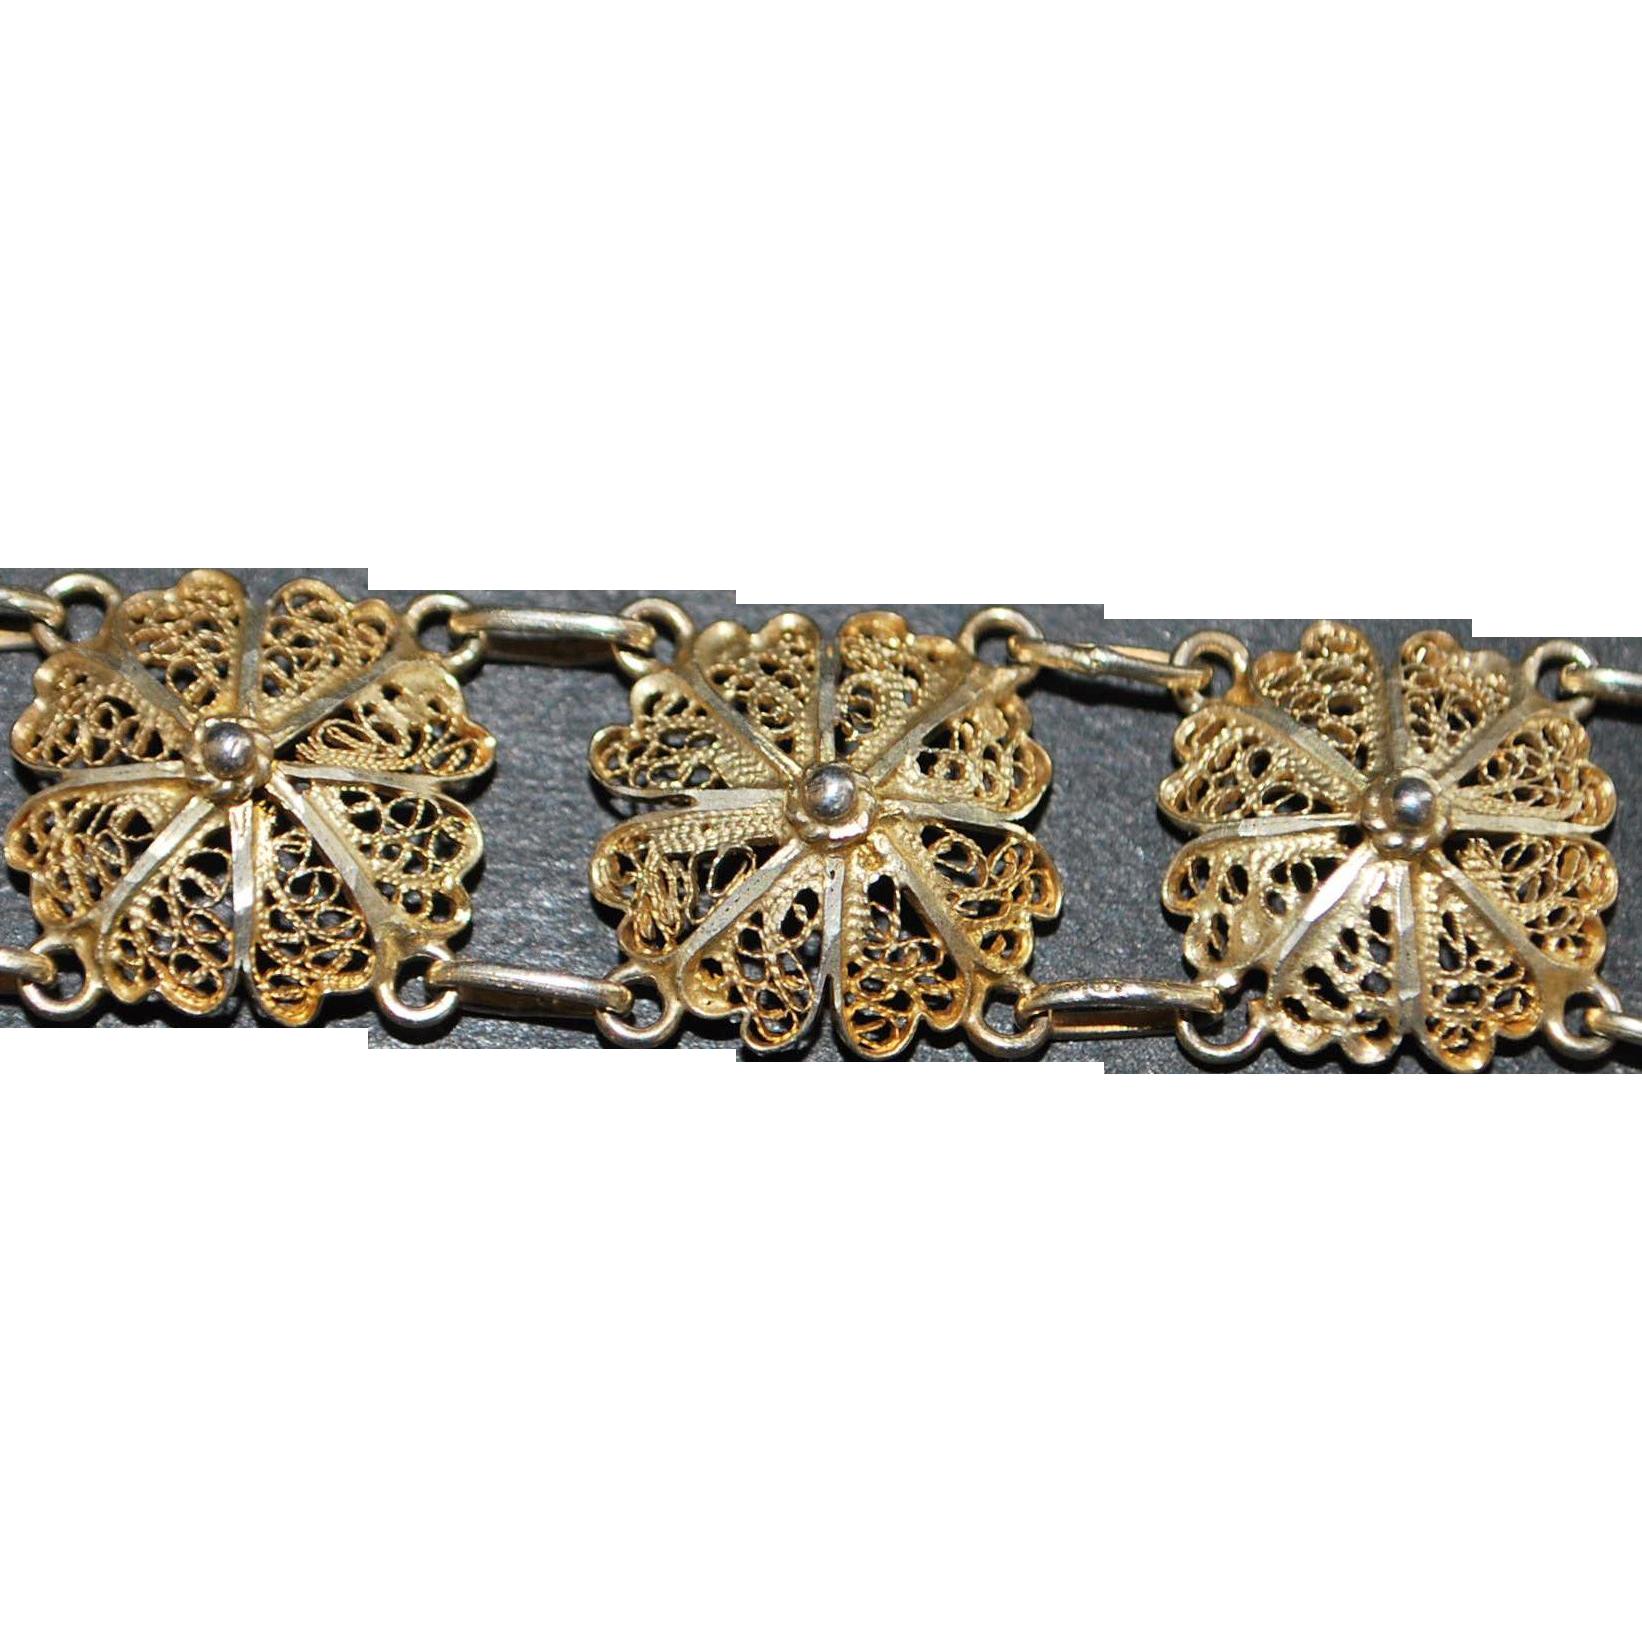 Sterling Silver Filigree Bracelet by Topazio - 1980's